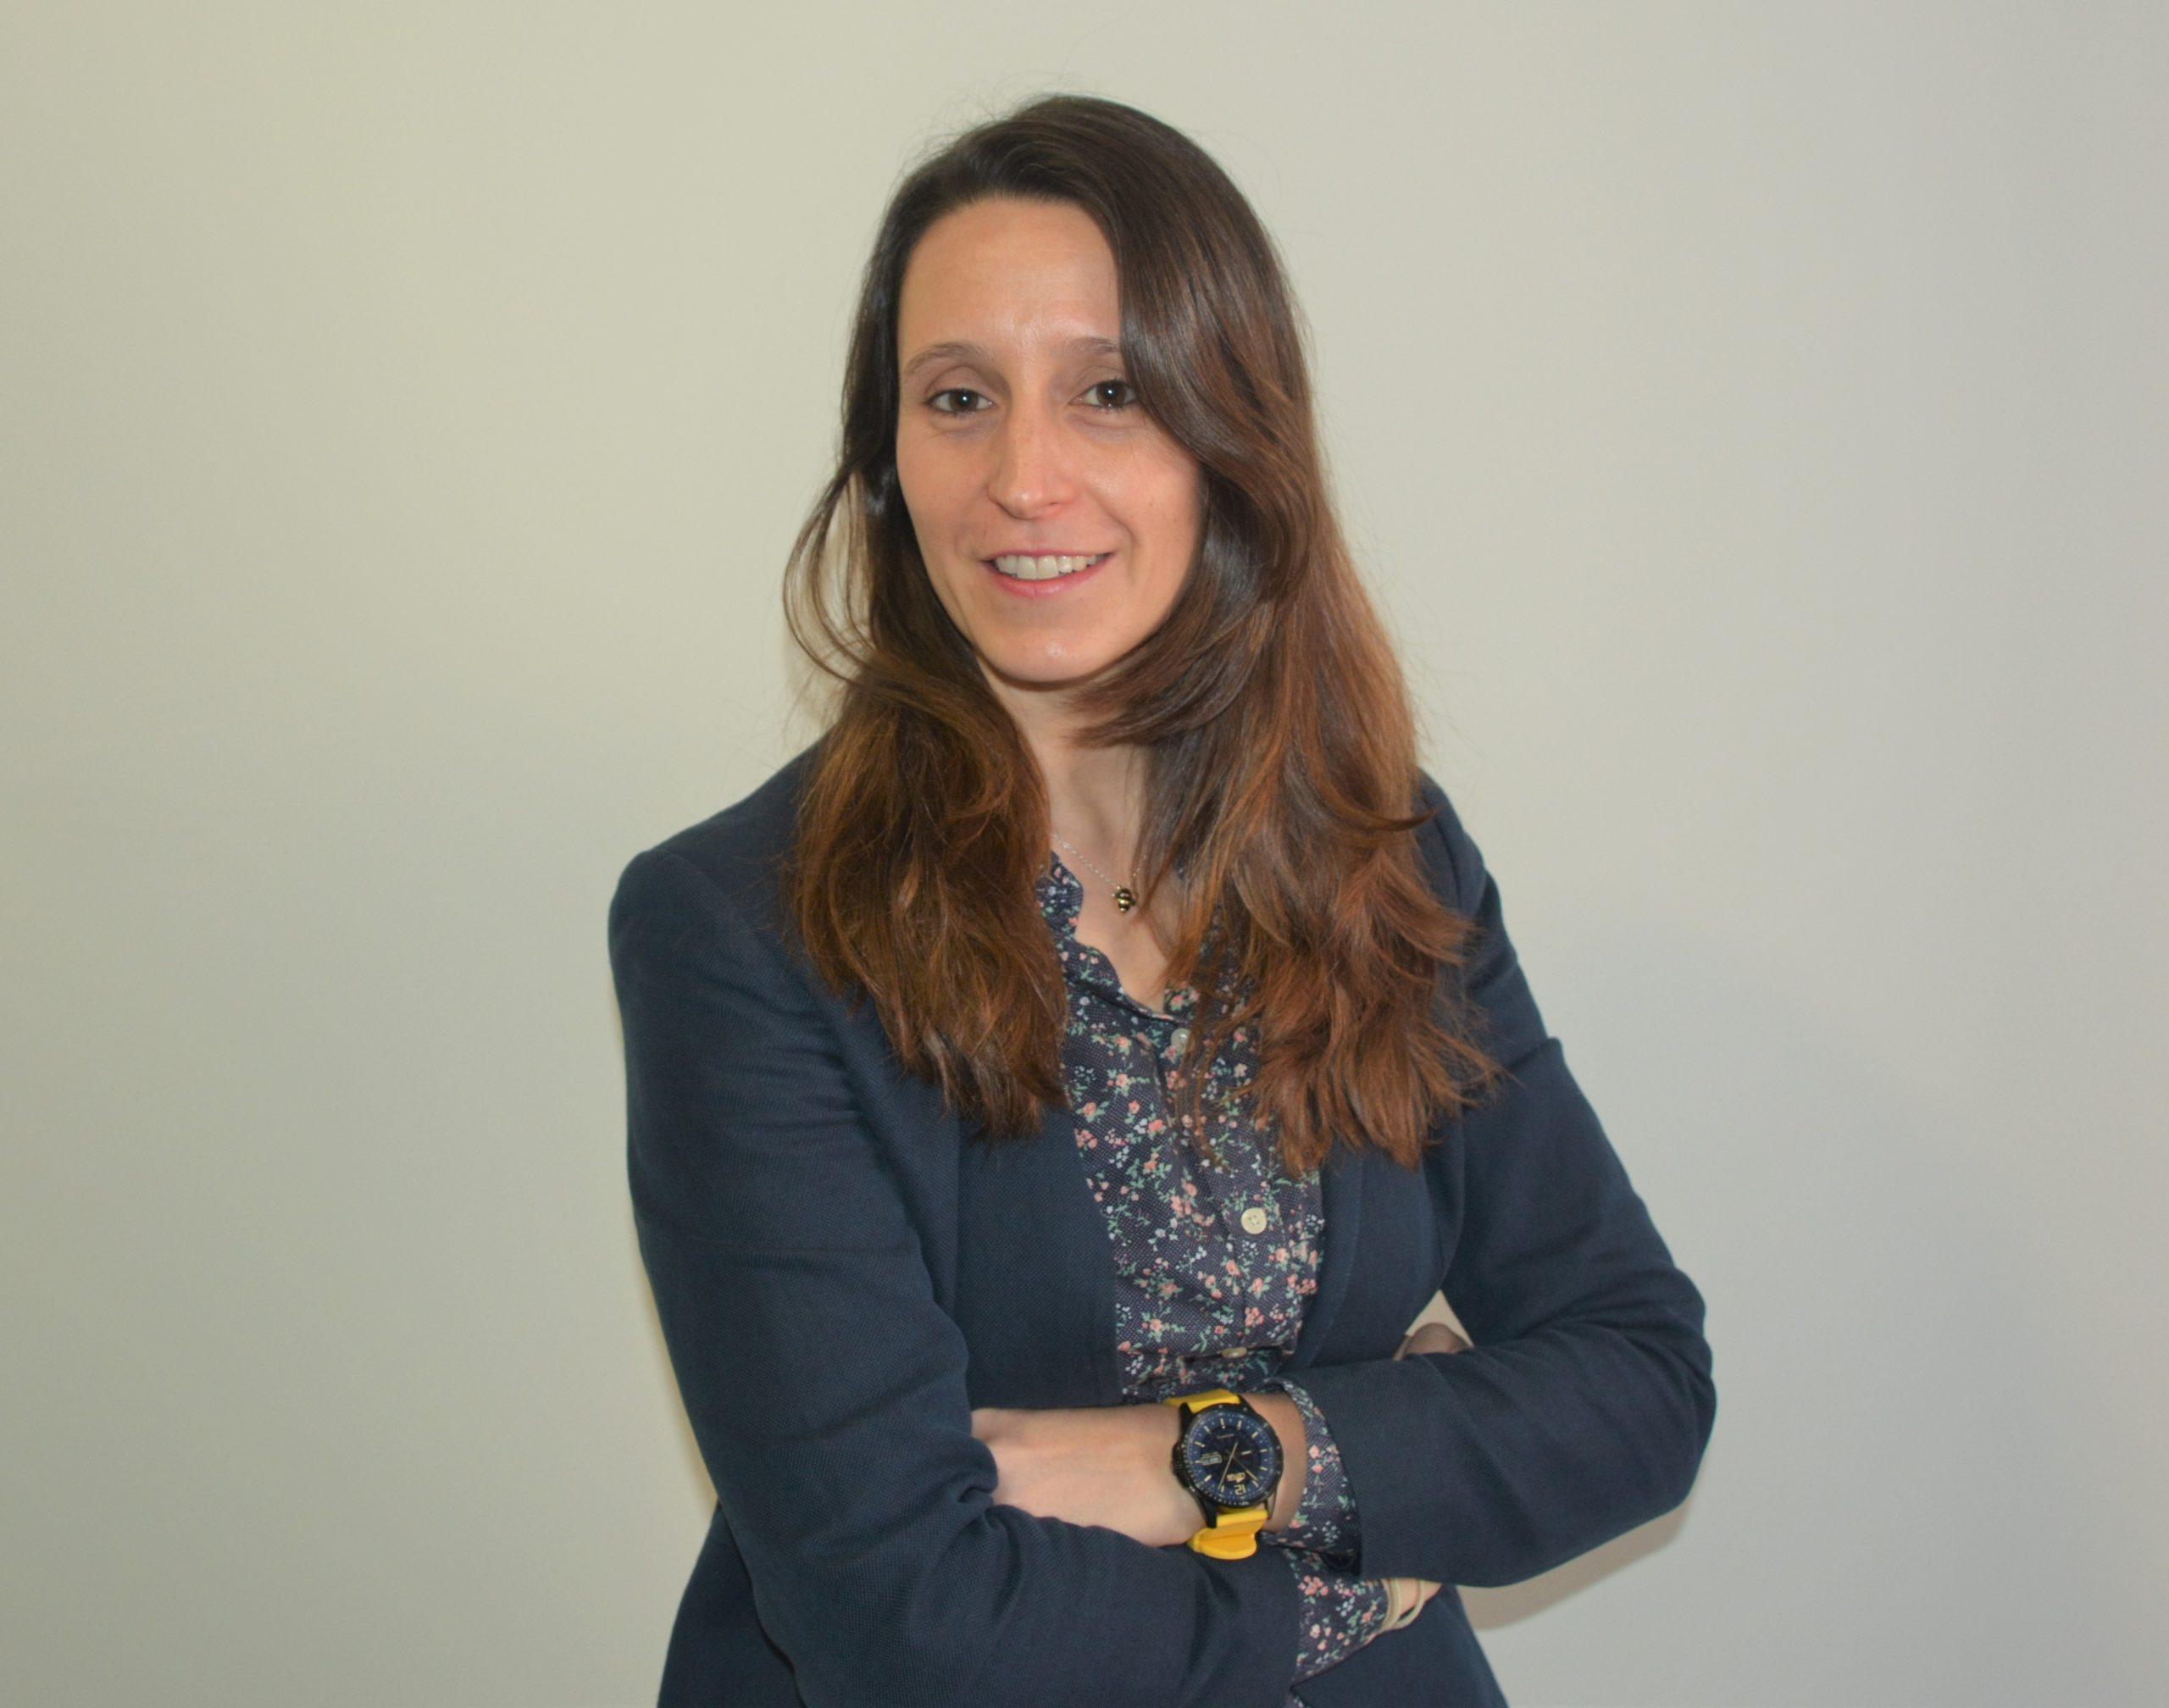 Raquel Simarro